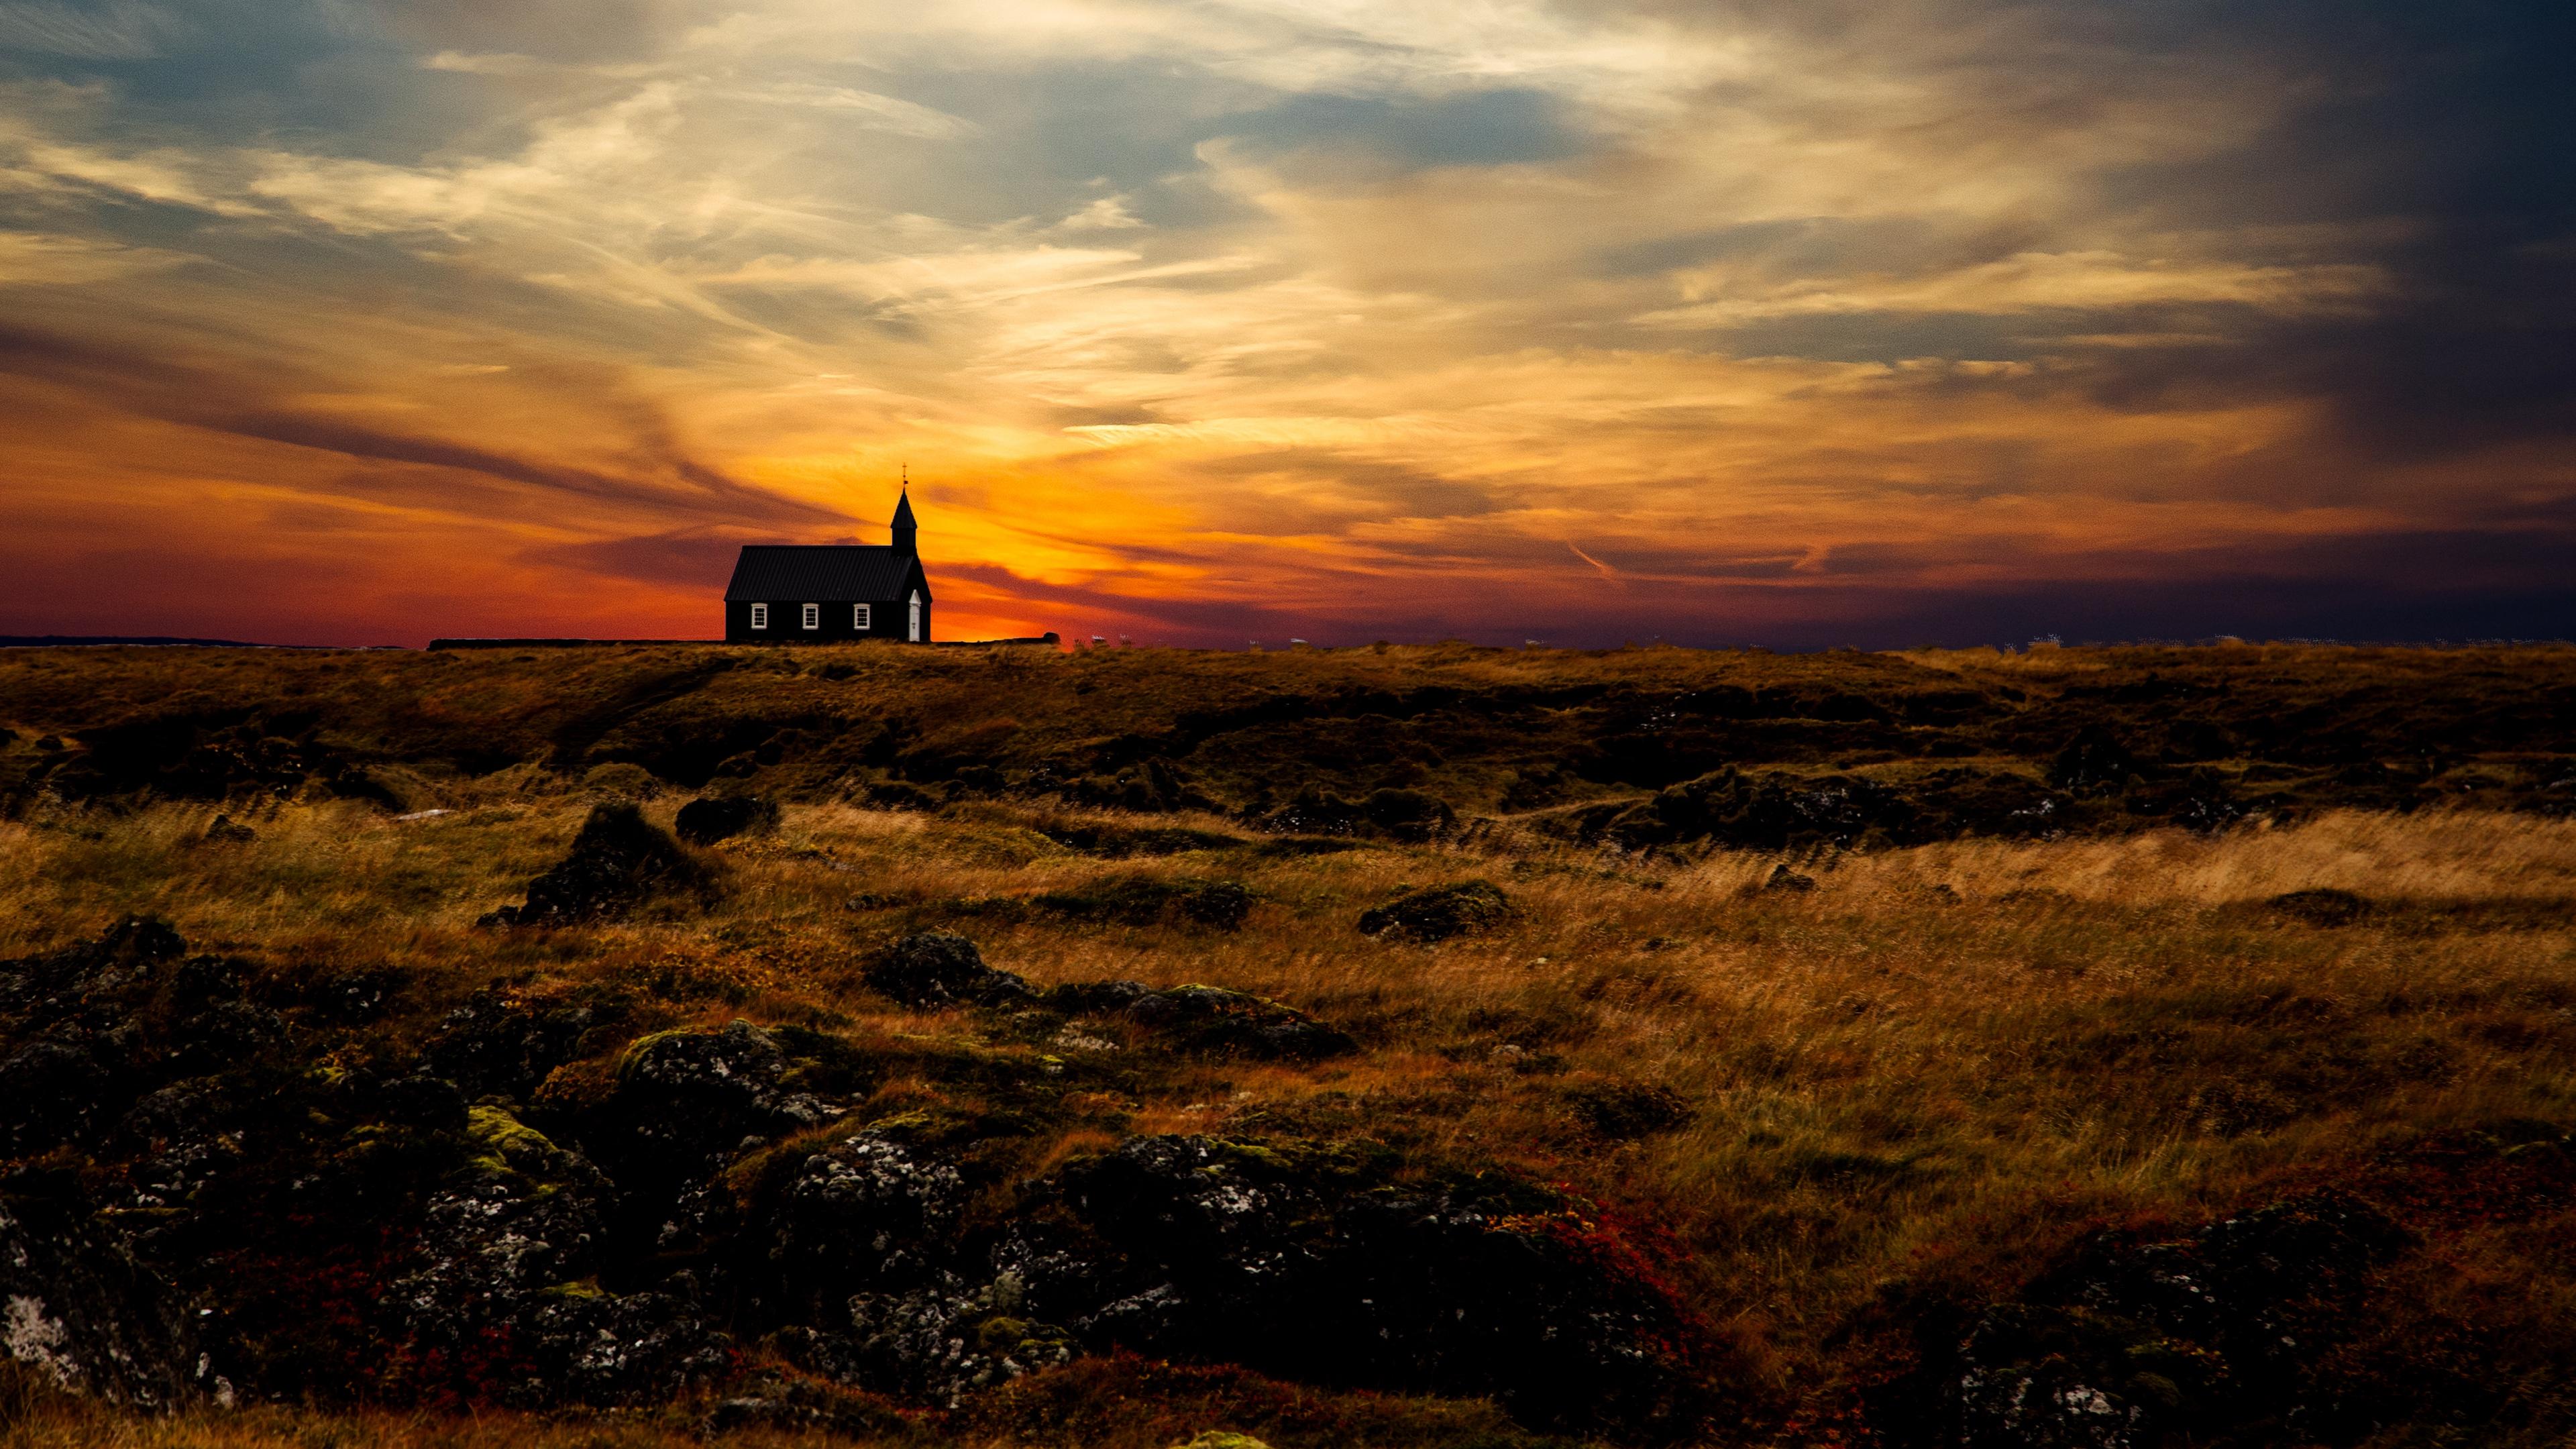 church temple horizon sunset grass sky iceland 4k 1540145817 - church, temple, horizon, sunset, grass, sky, iceland 4k - Temple, Horizon, Church